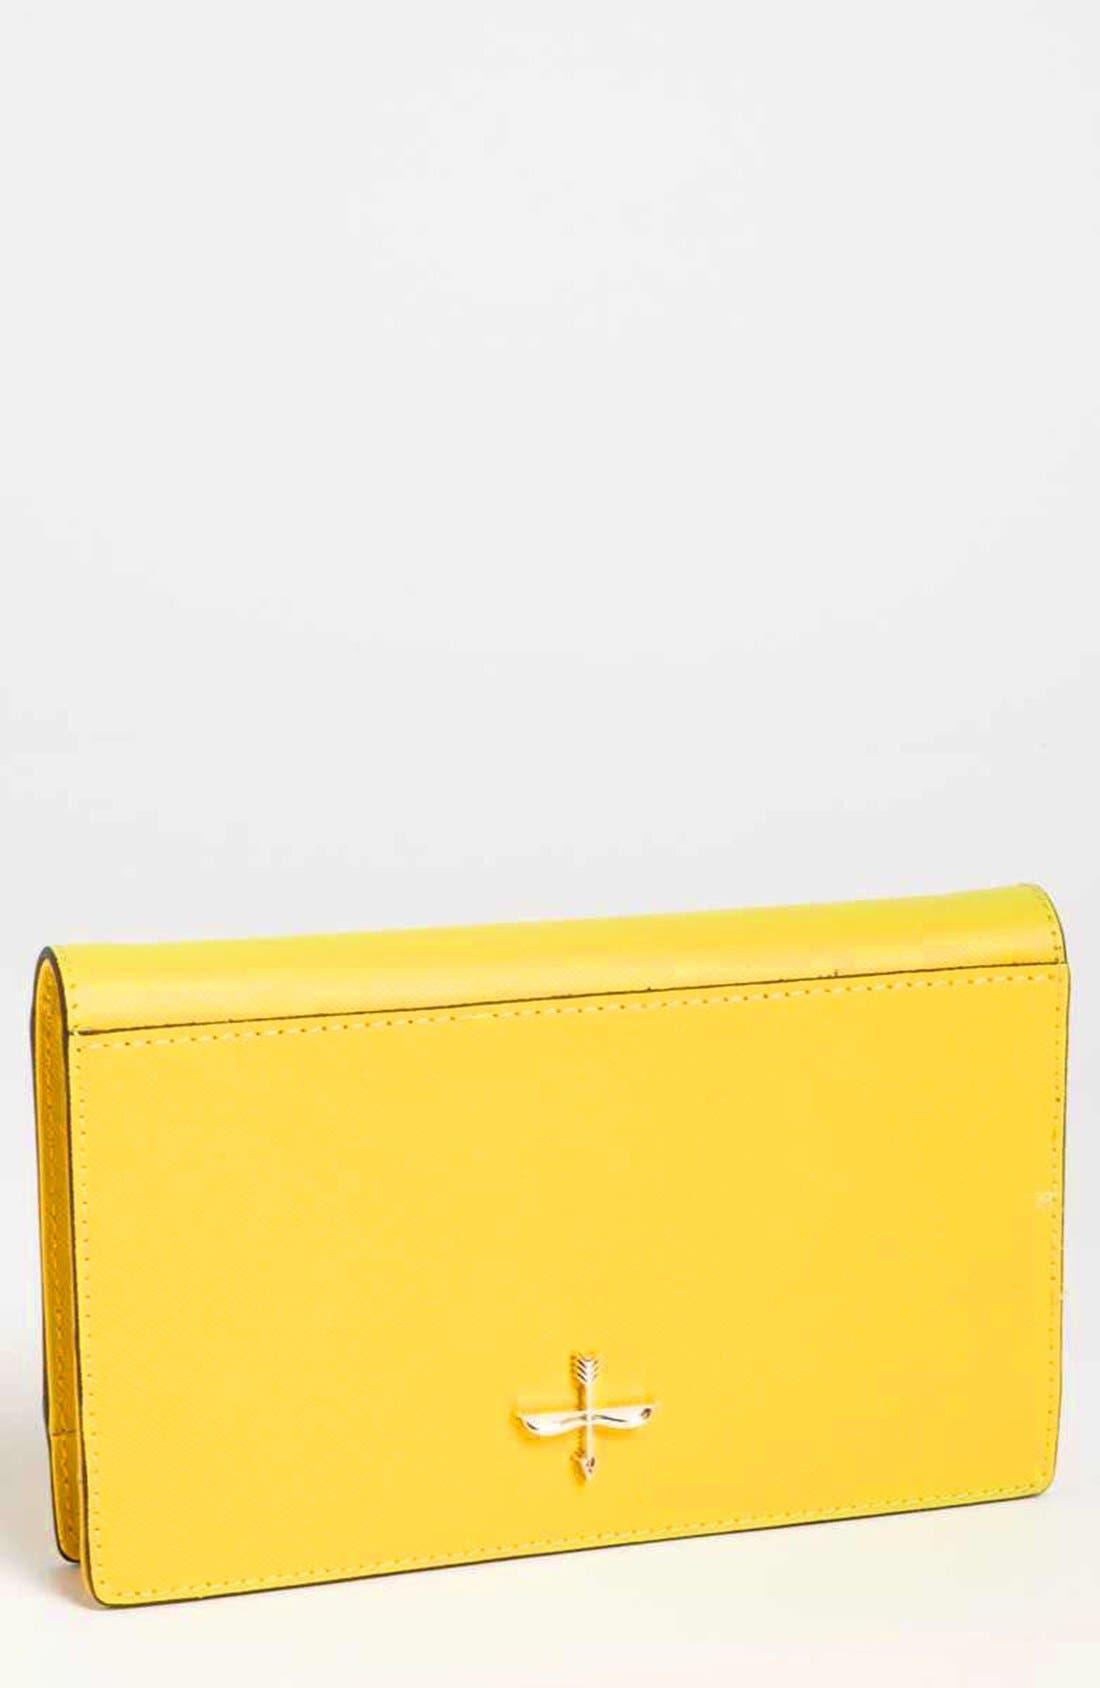 Main Image - Pour la Victoire 'Yves' Zip Around Wallet